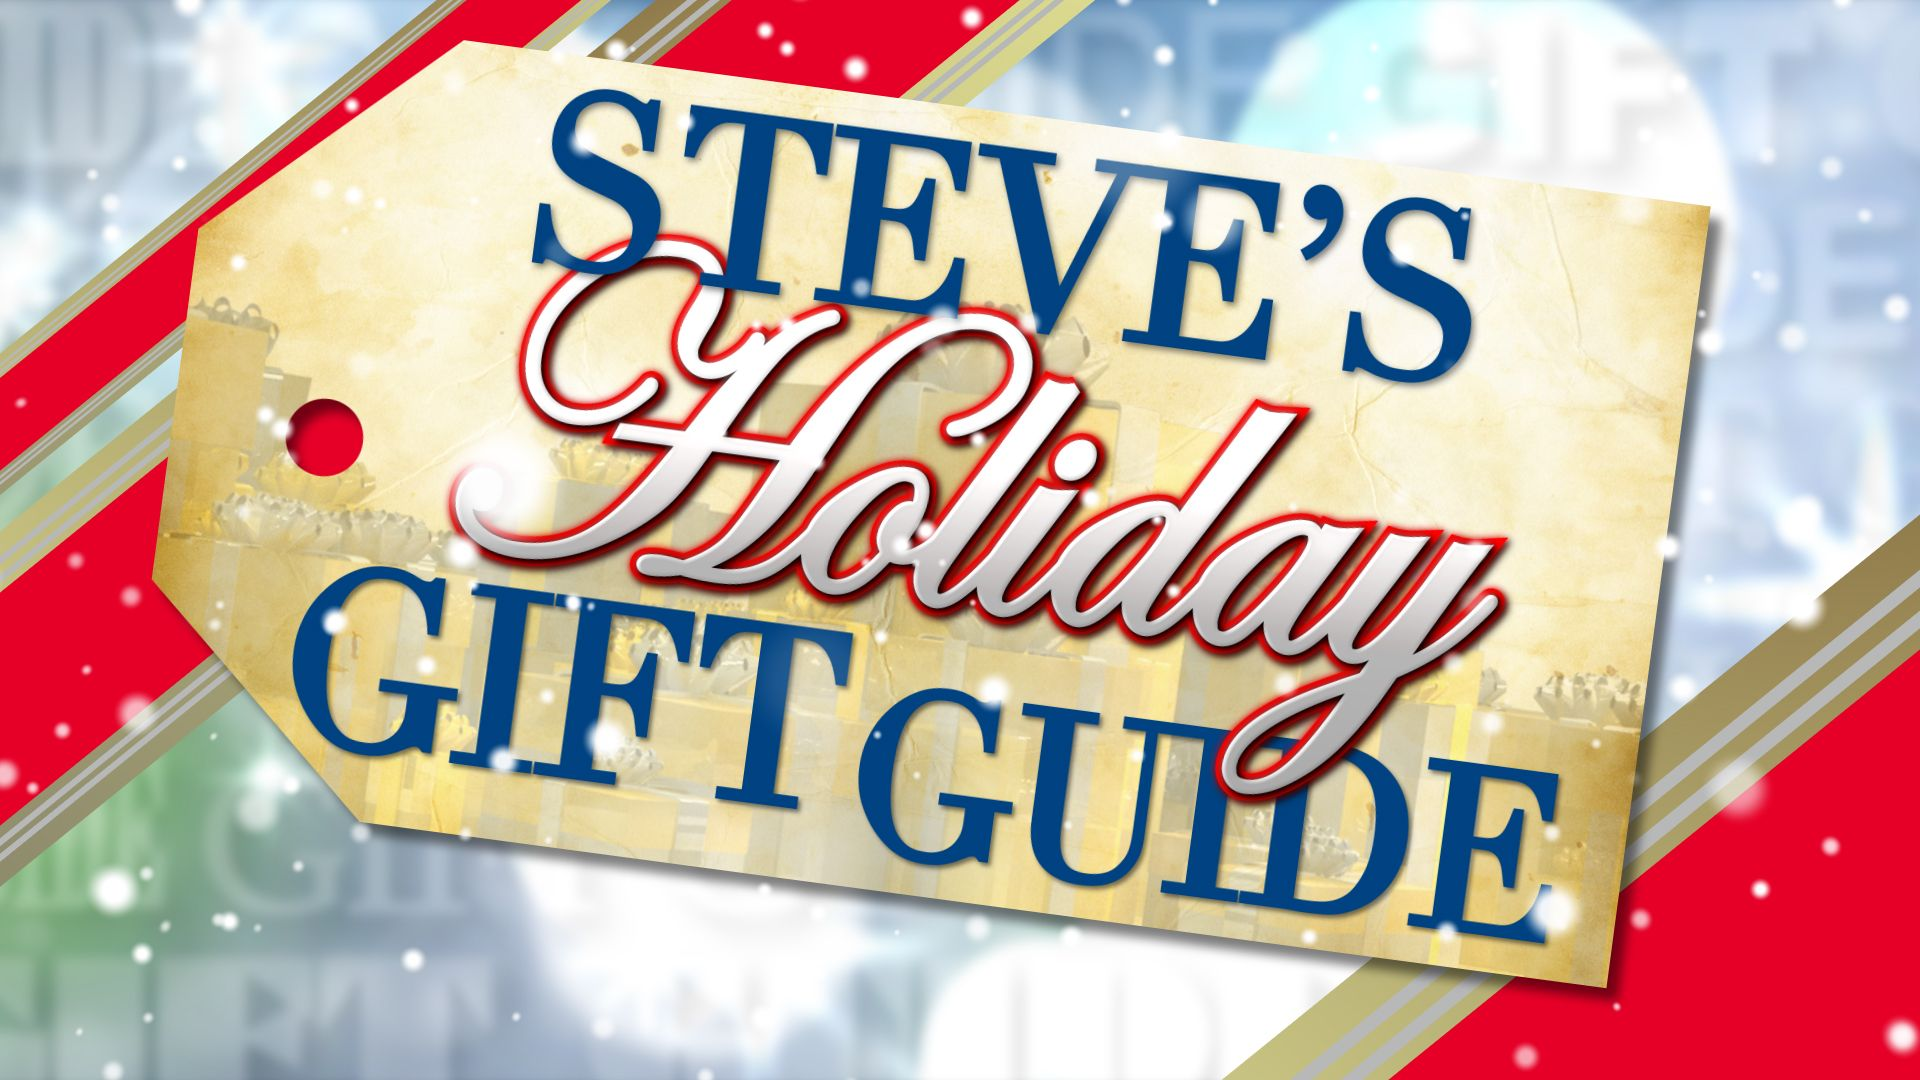 Steve harvey holiday giveaway